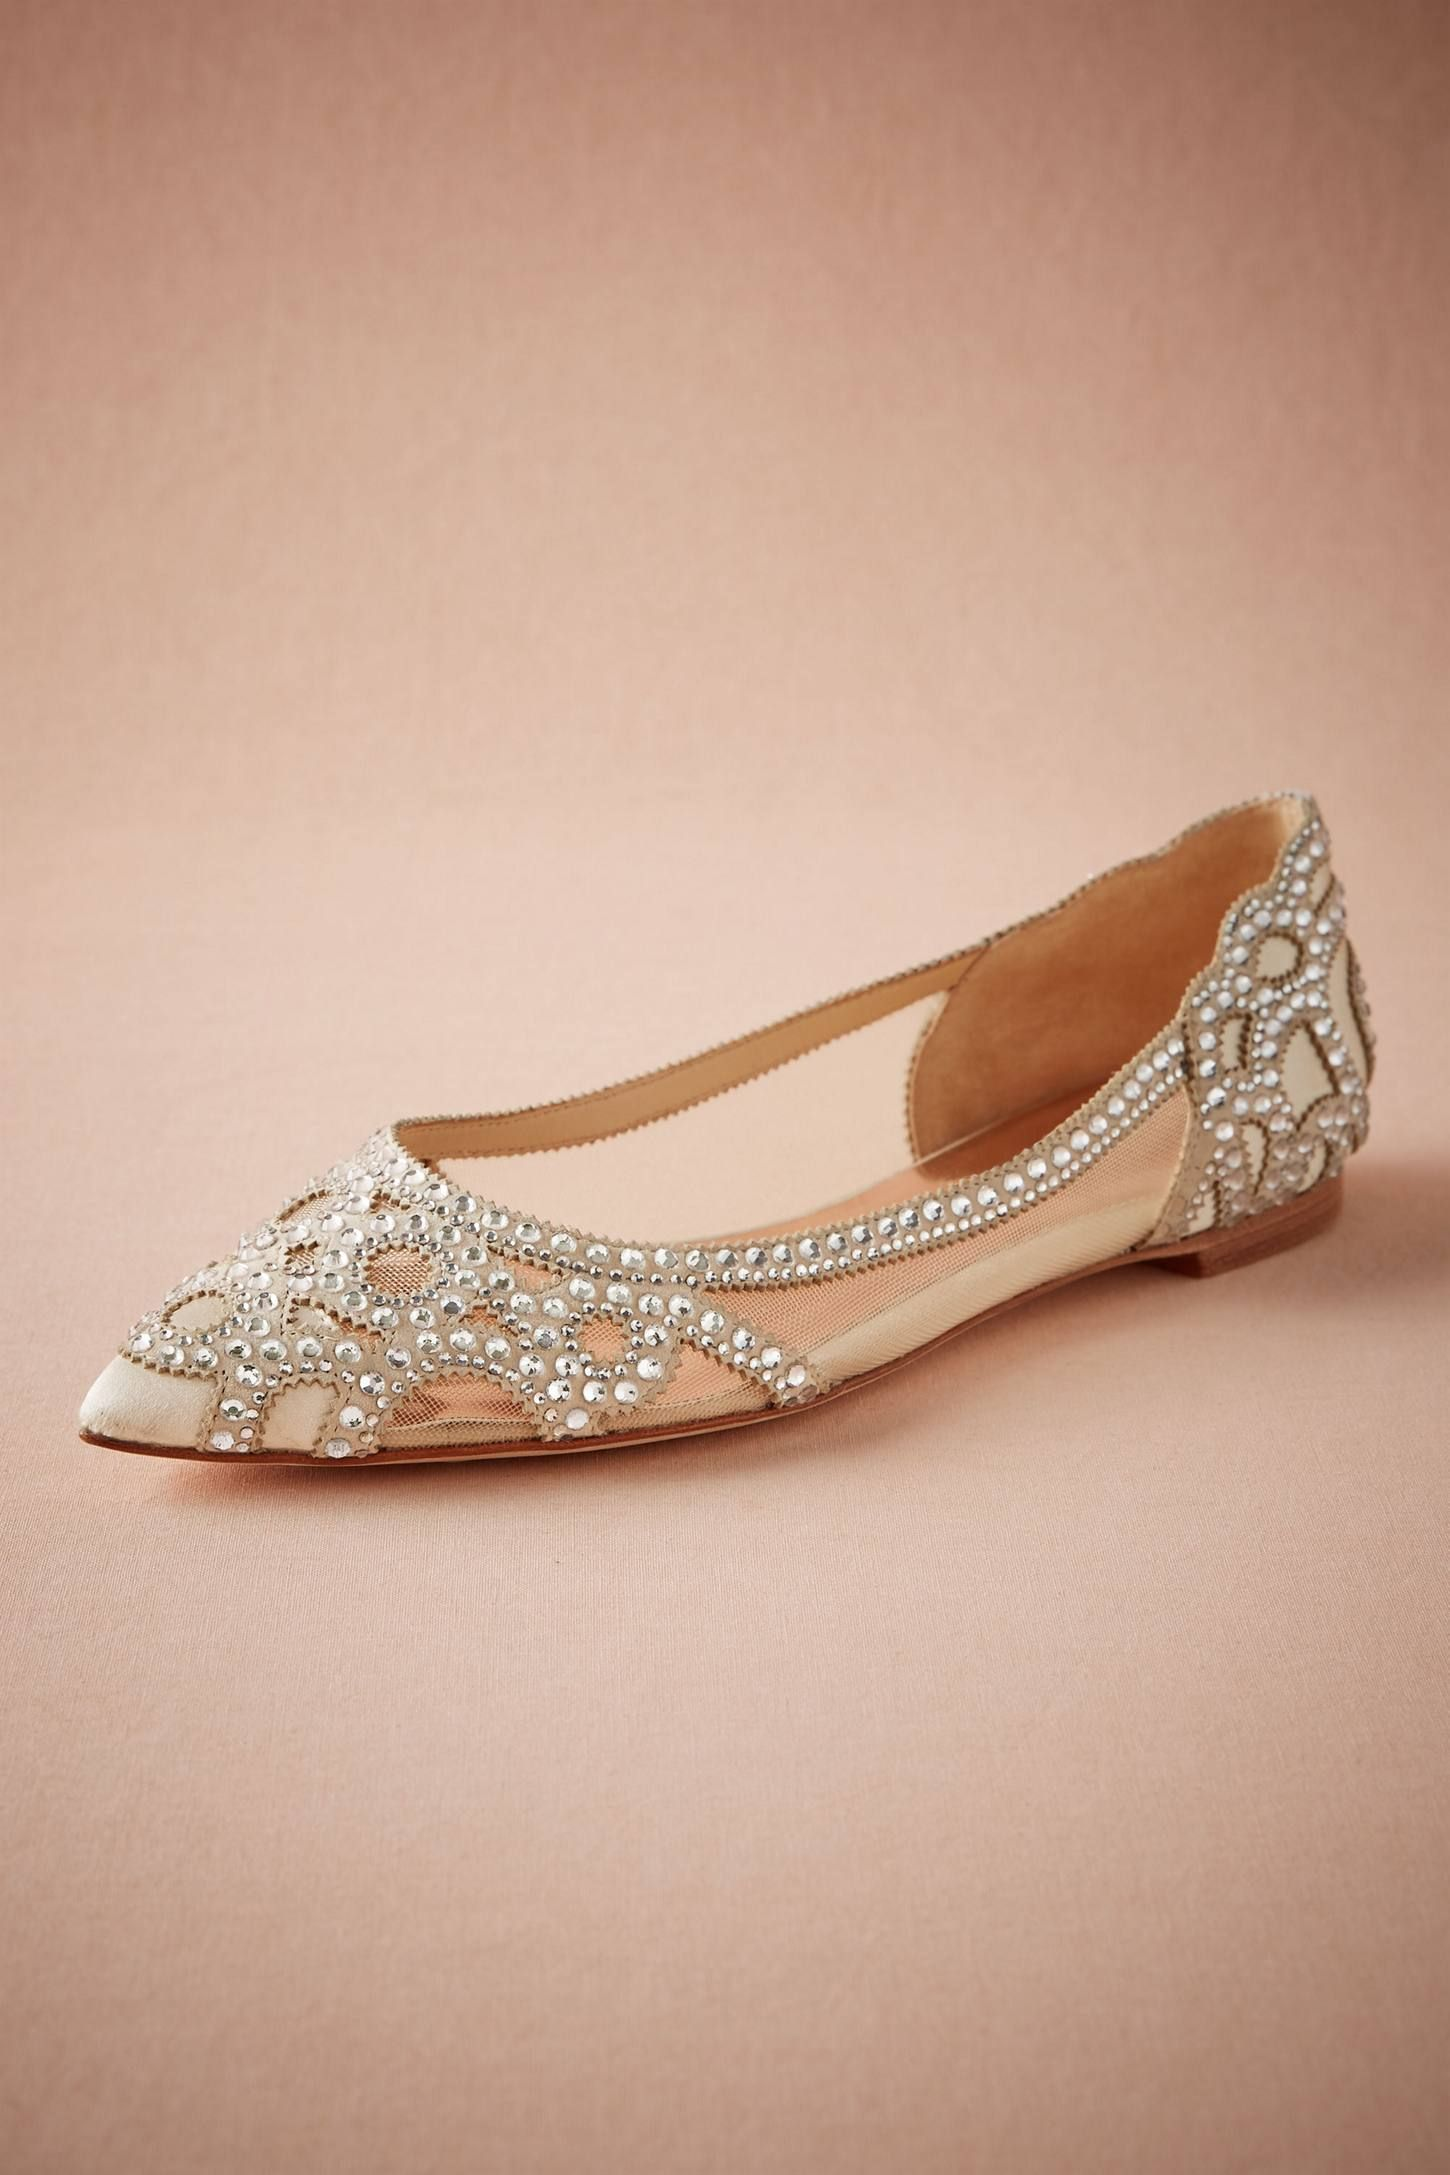 952f5c35616 24 Chic Beach Wedding Shoes